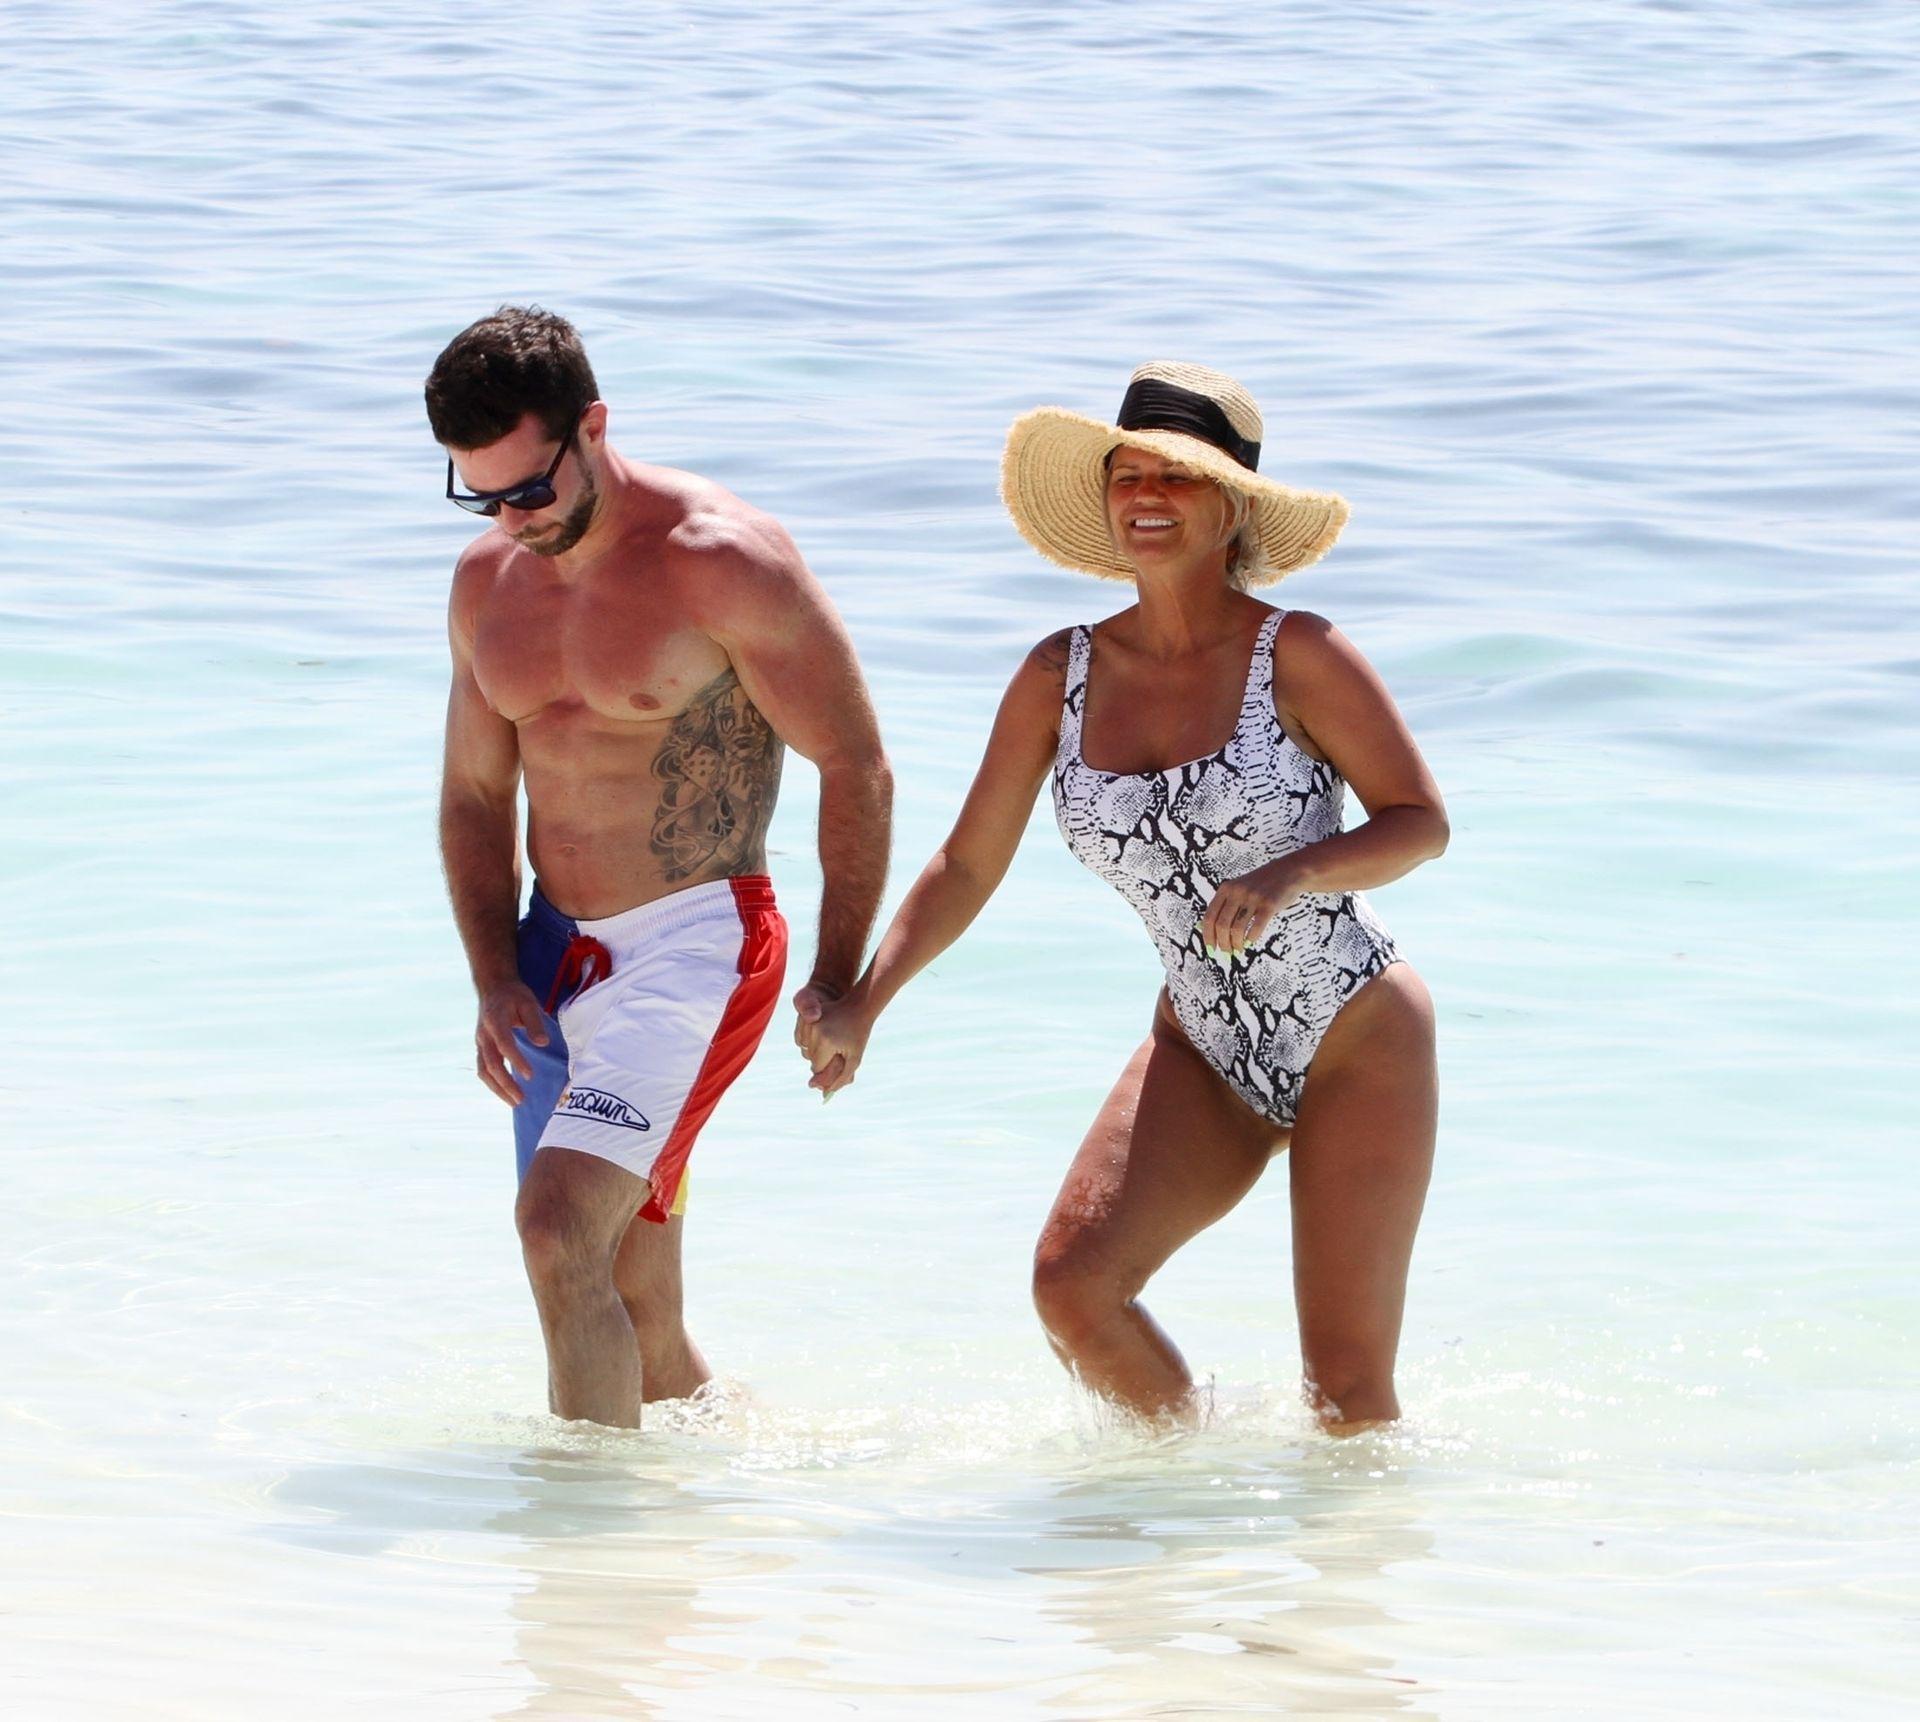 Kerry Katona & Ryan Mahoney Hit The Beach On Holiday At Their Luxury 5 Star Resort Ayada Maldives 0016